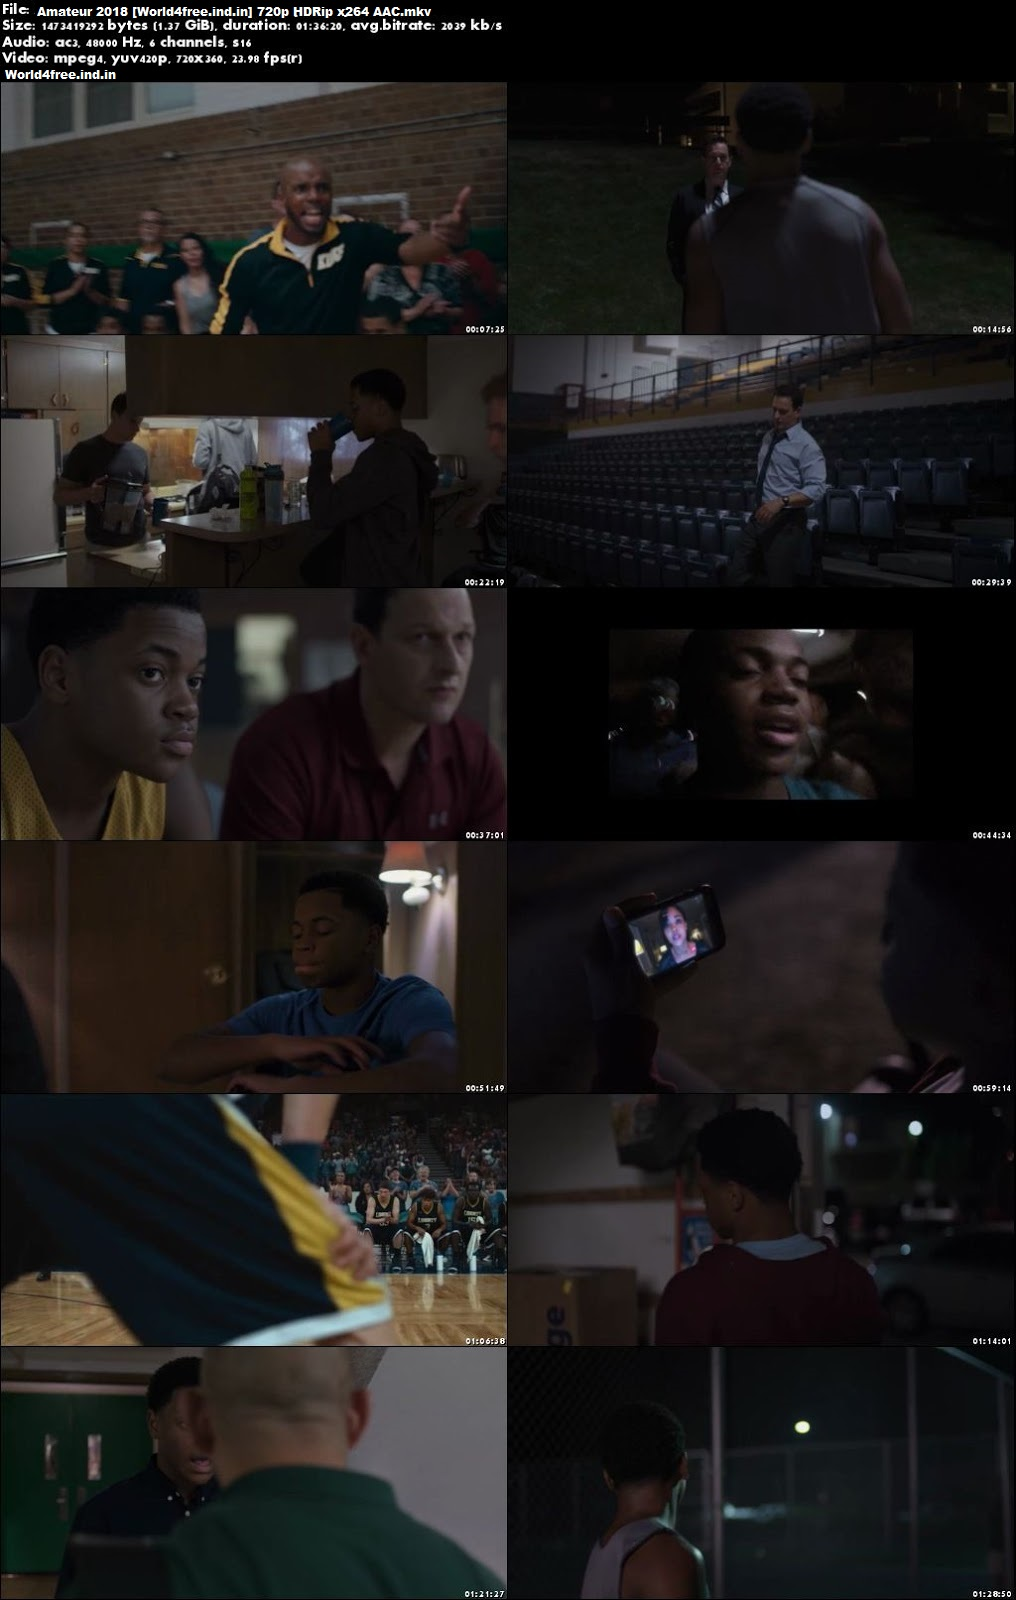 Amateur 2018 worldfree4u Full HDRip 720p English Movie Download